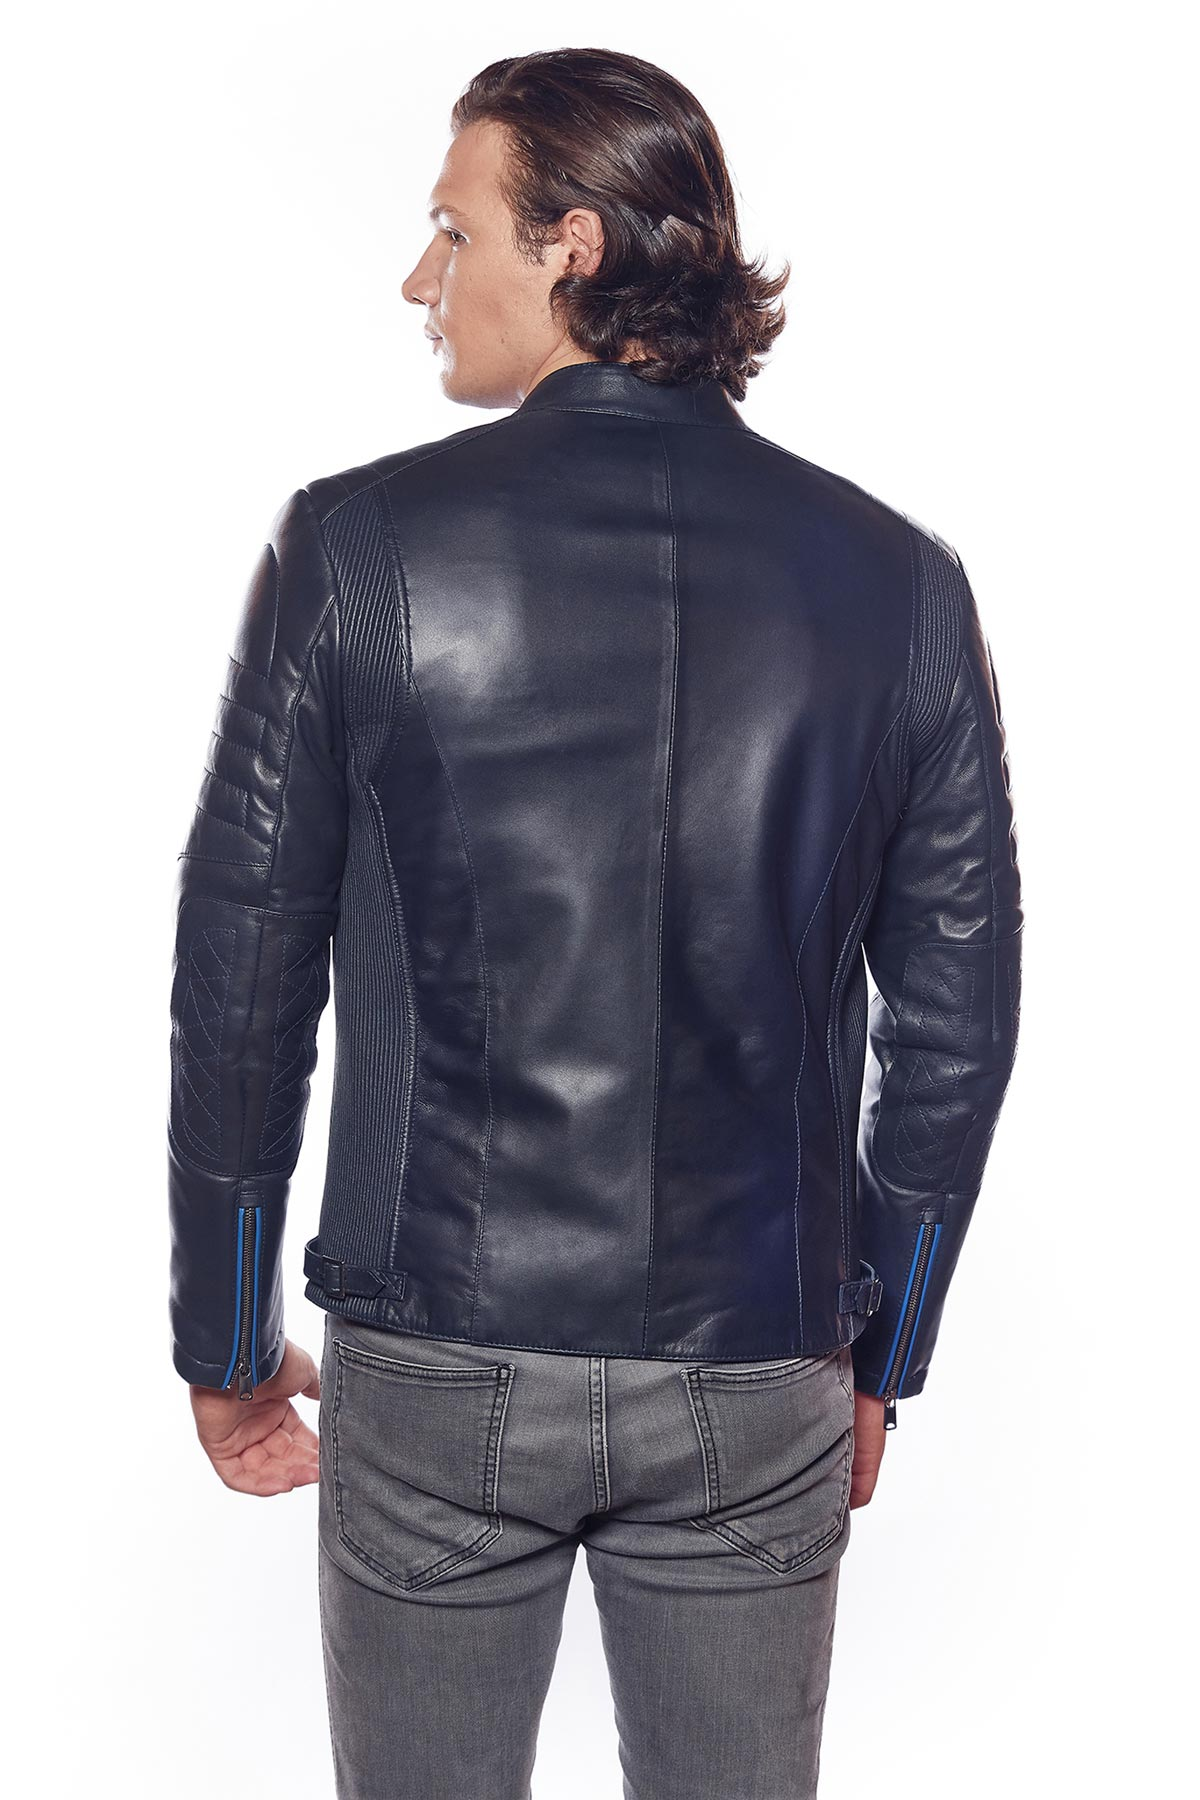 navy leather jacket mens